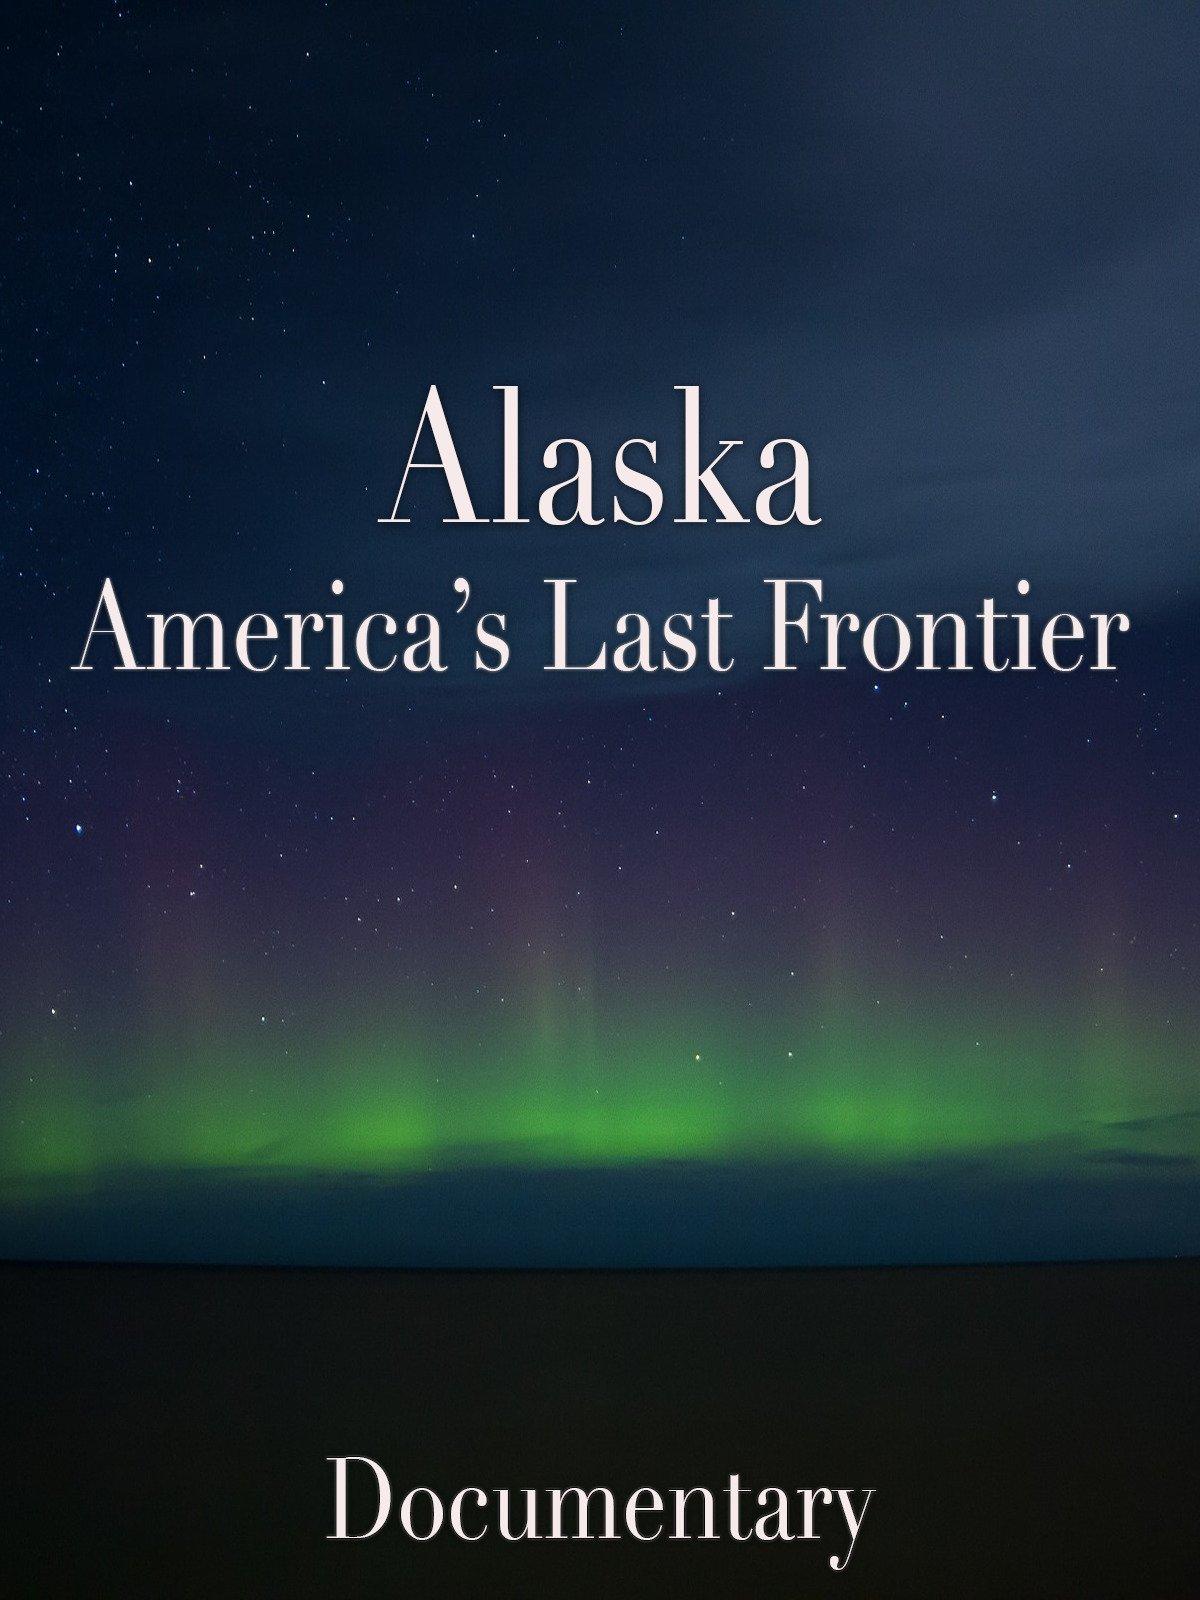 Alaska America's Last Frontier Documentary